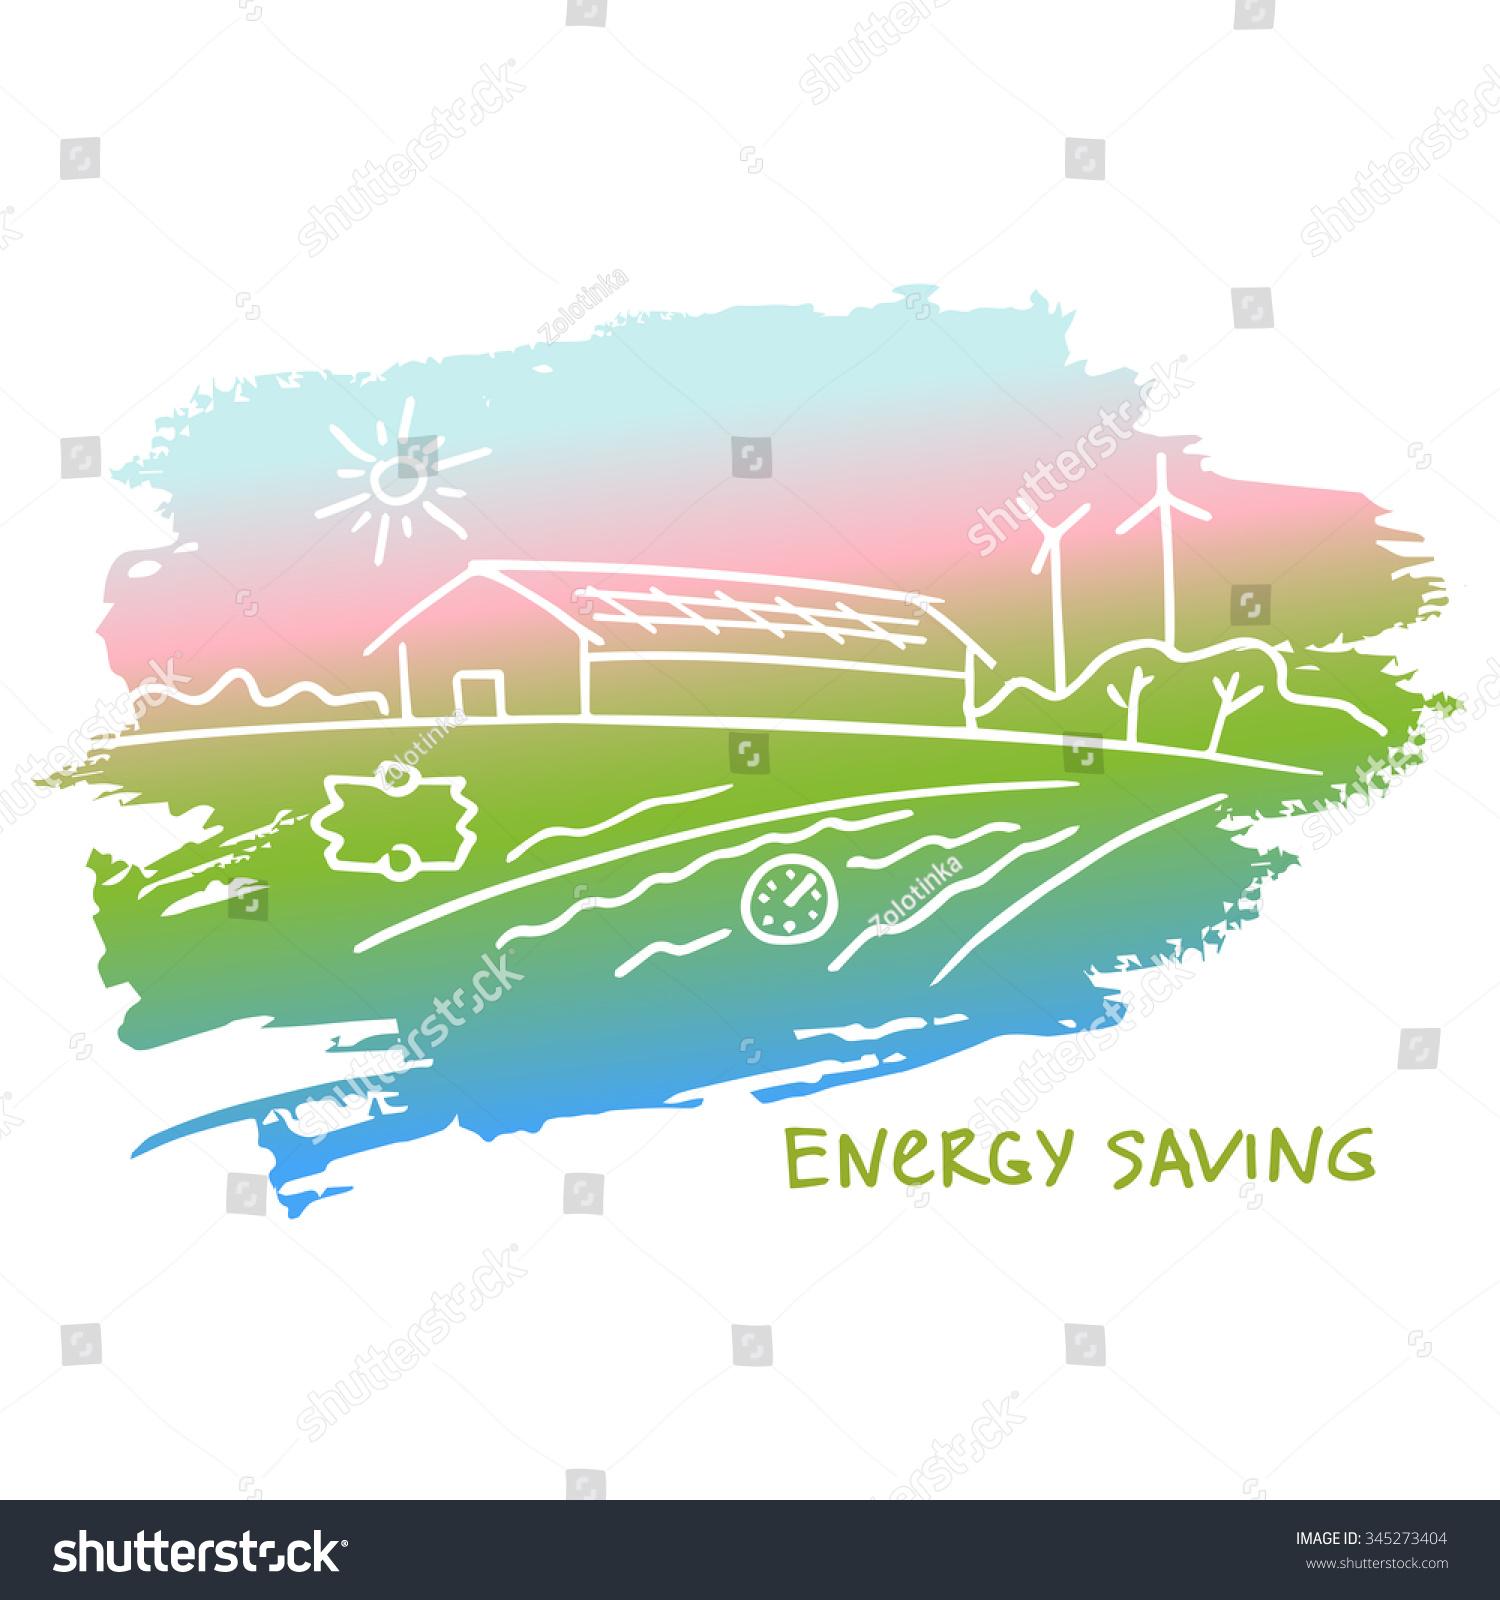 Eco Friendly Construction Illustration Energy Efficient Constructionenergy Saving Eco